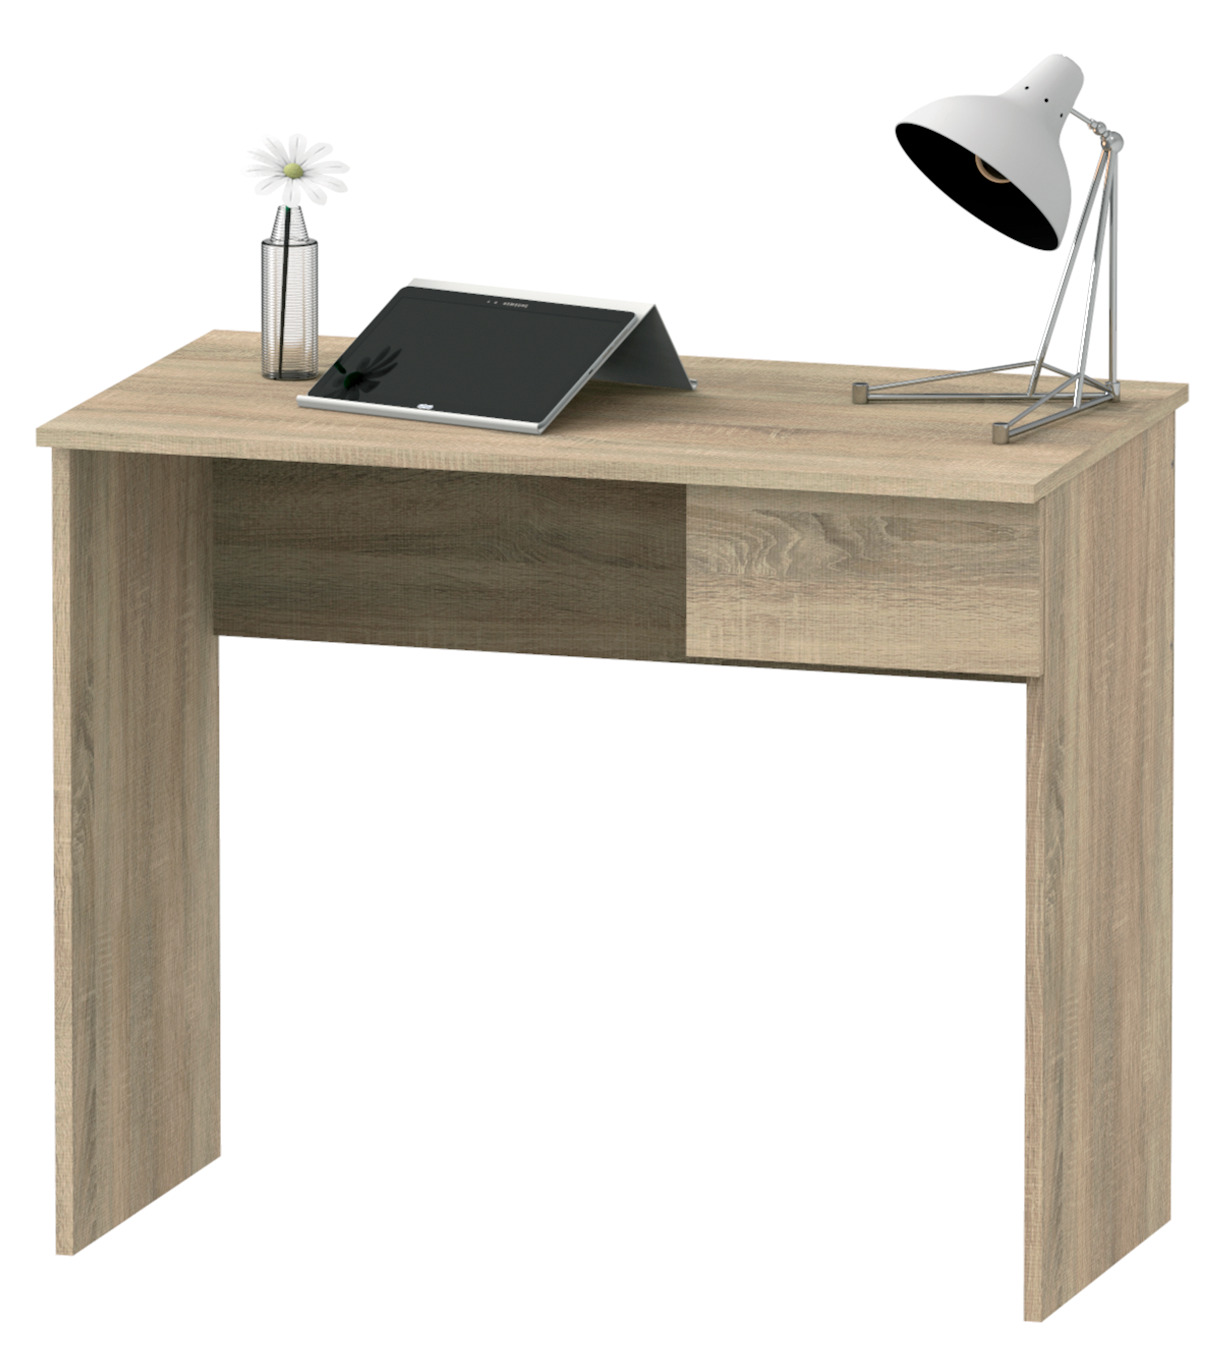 Mesa de ordenador escritorio juvenil con cajon color cambrian para estudio 90cm